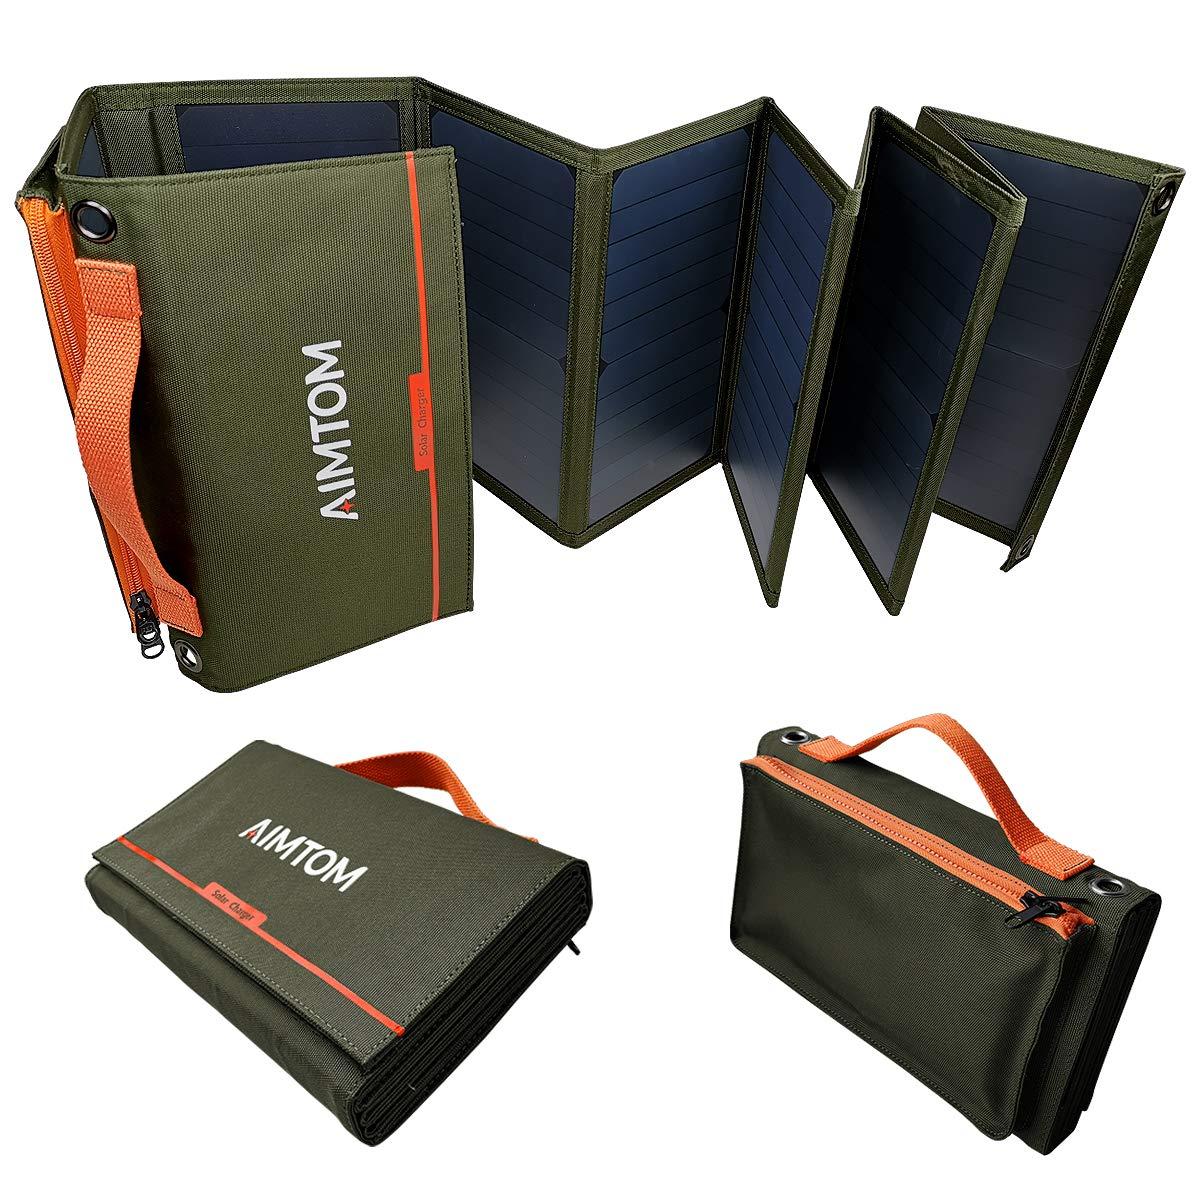 AIMTOM Portable Solar Charger